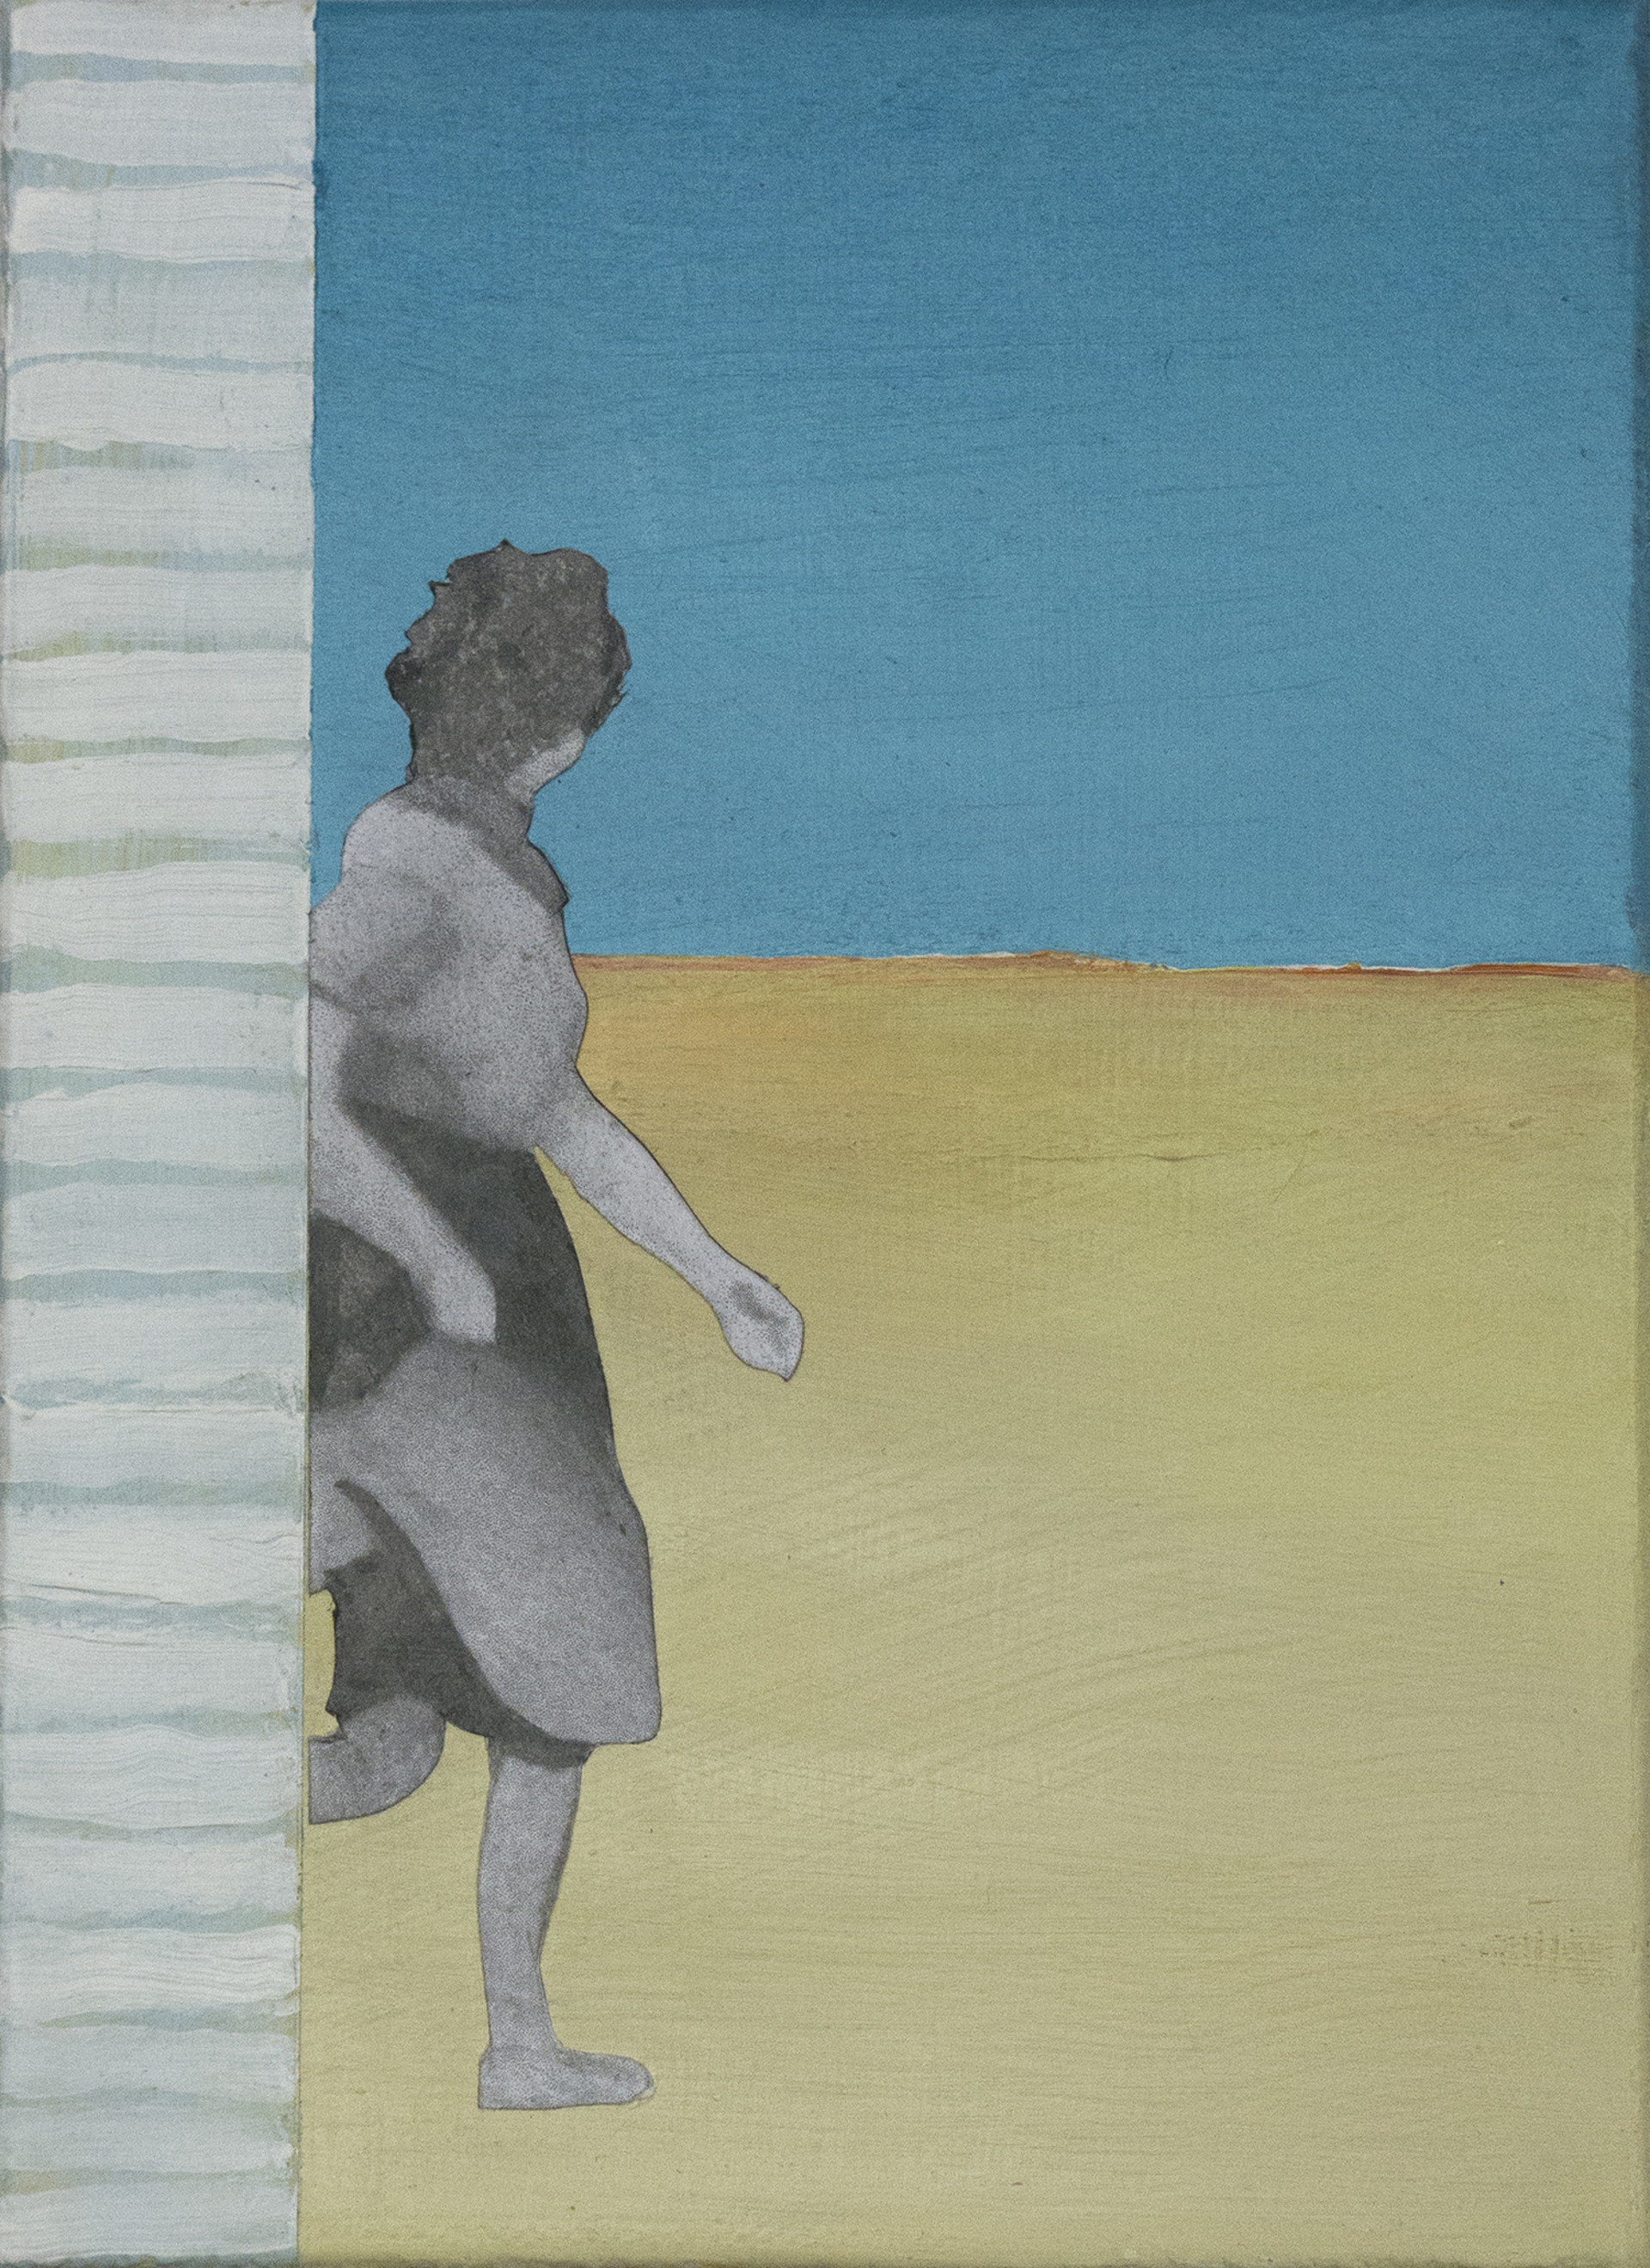 Elsie Emerging by David Sebberson